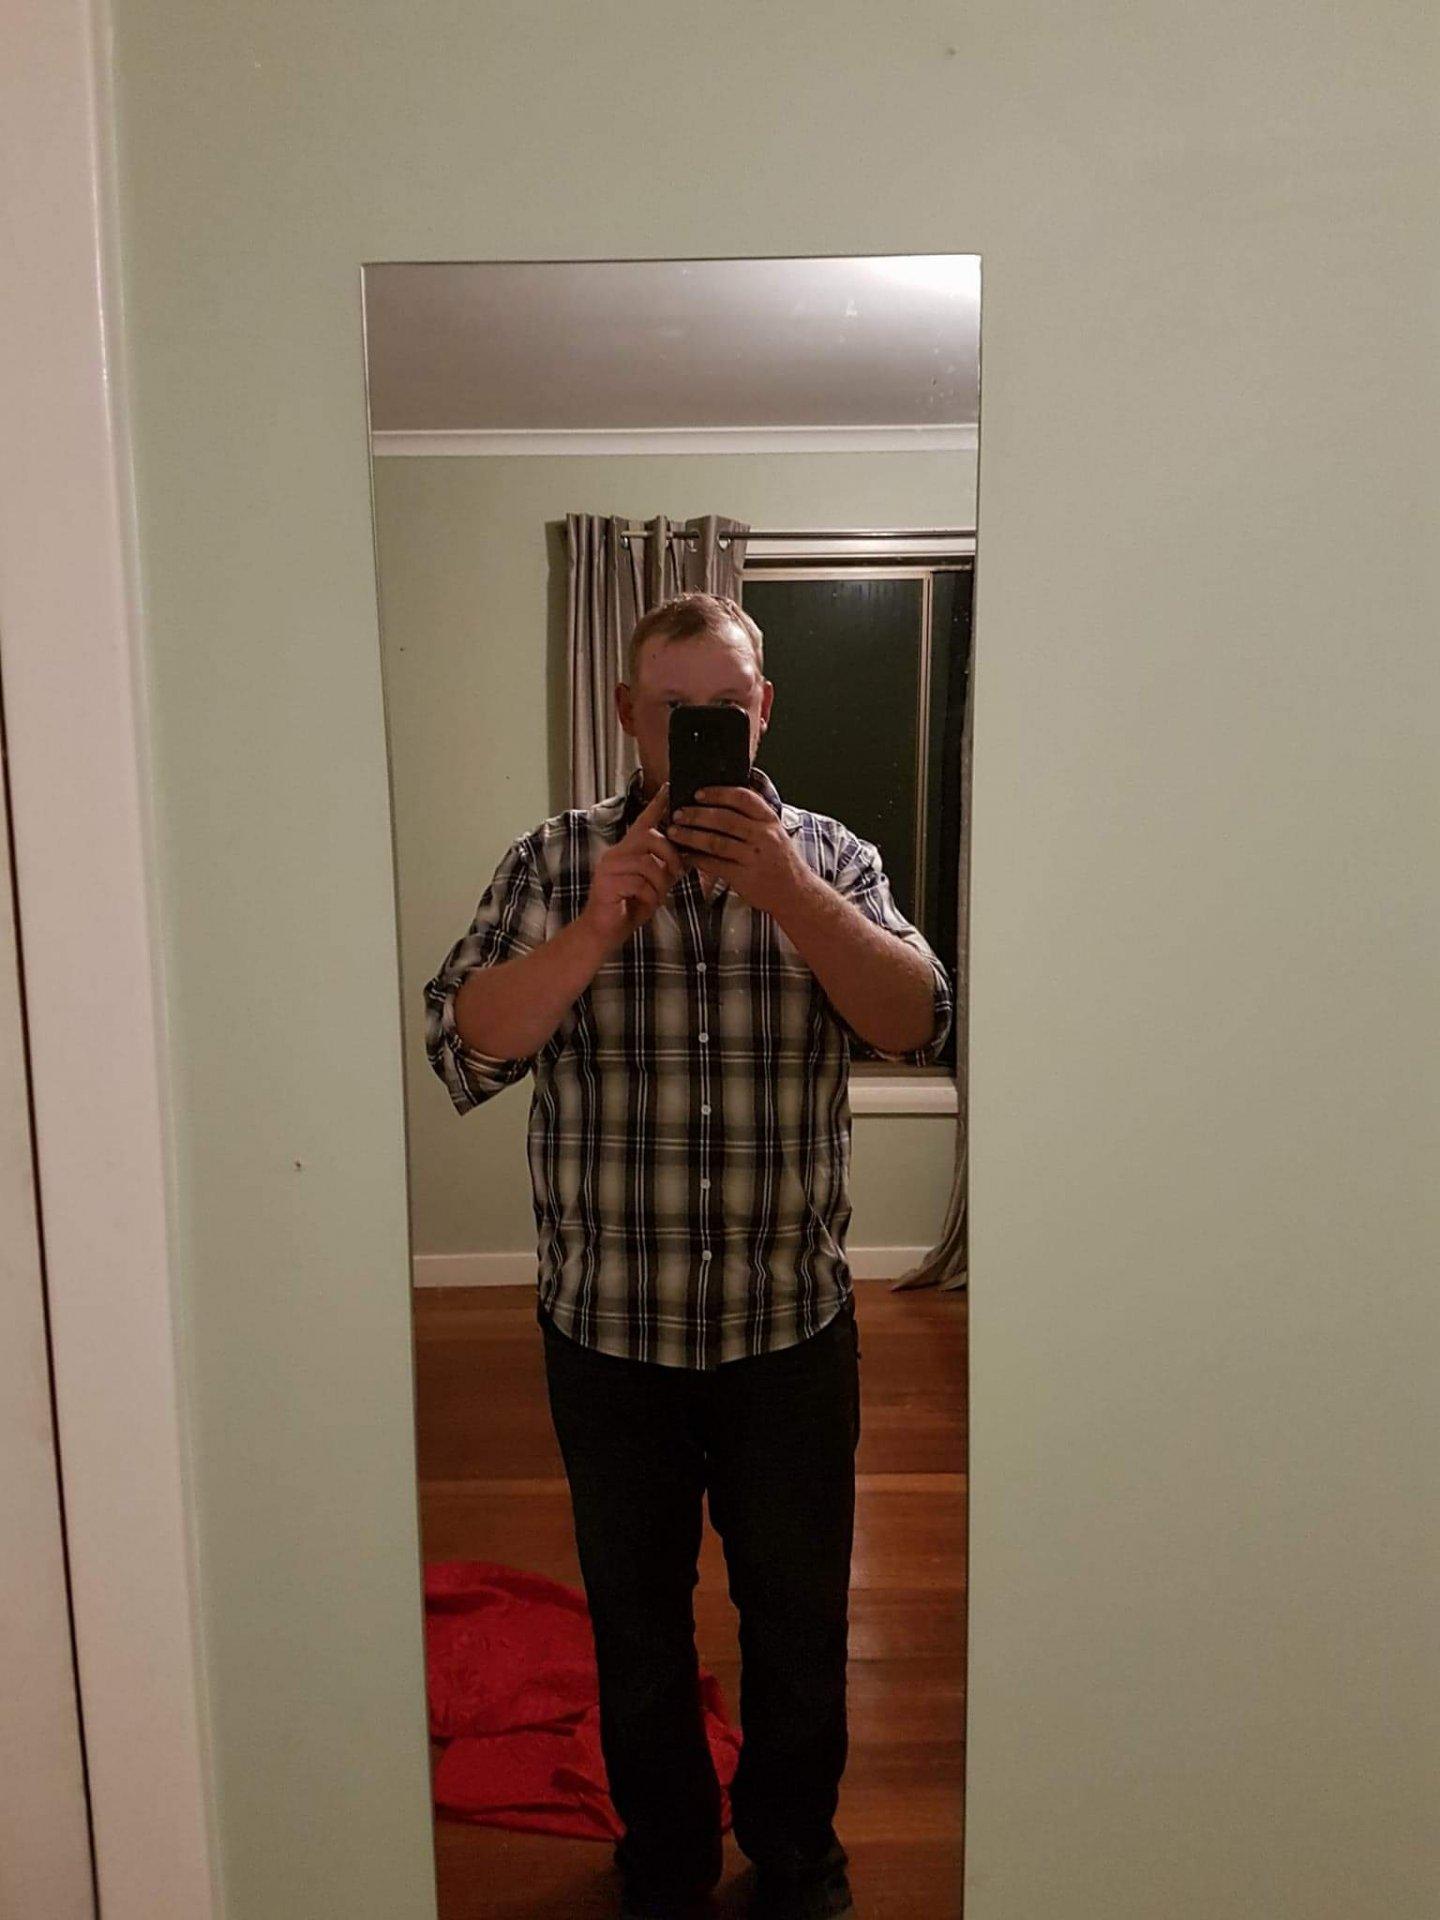 Dan87 from Tasmania,Australia